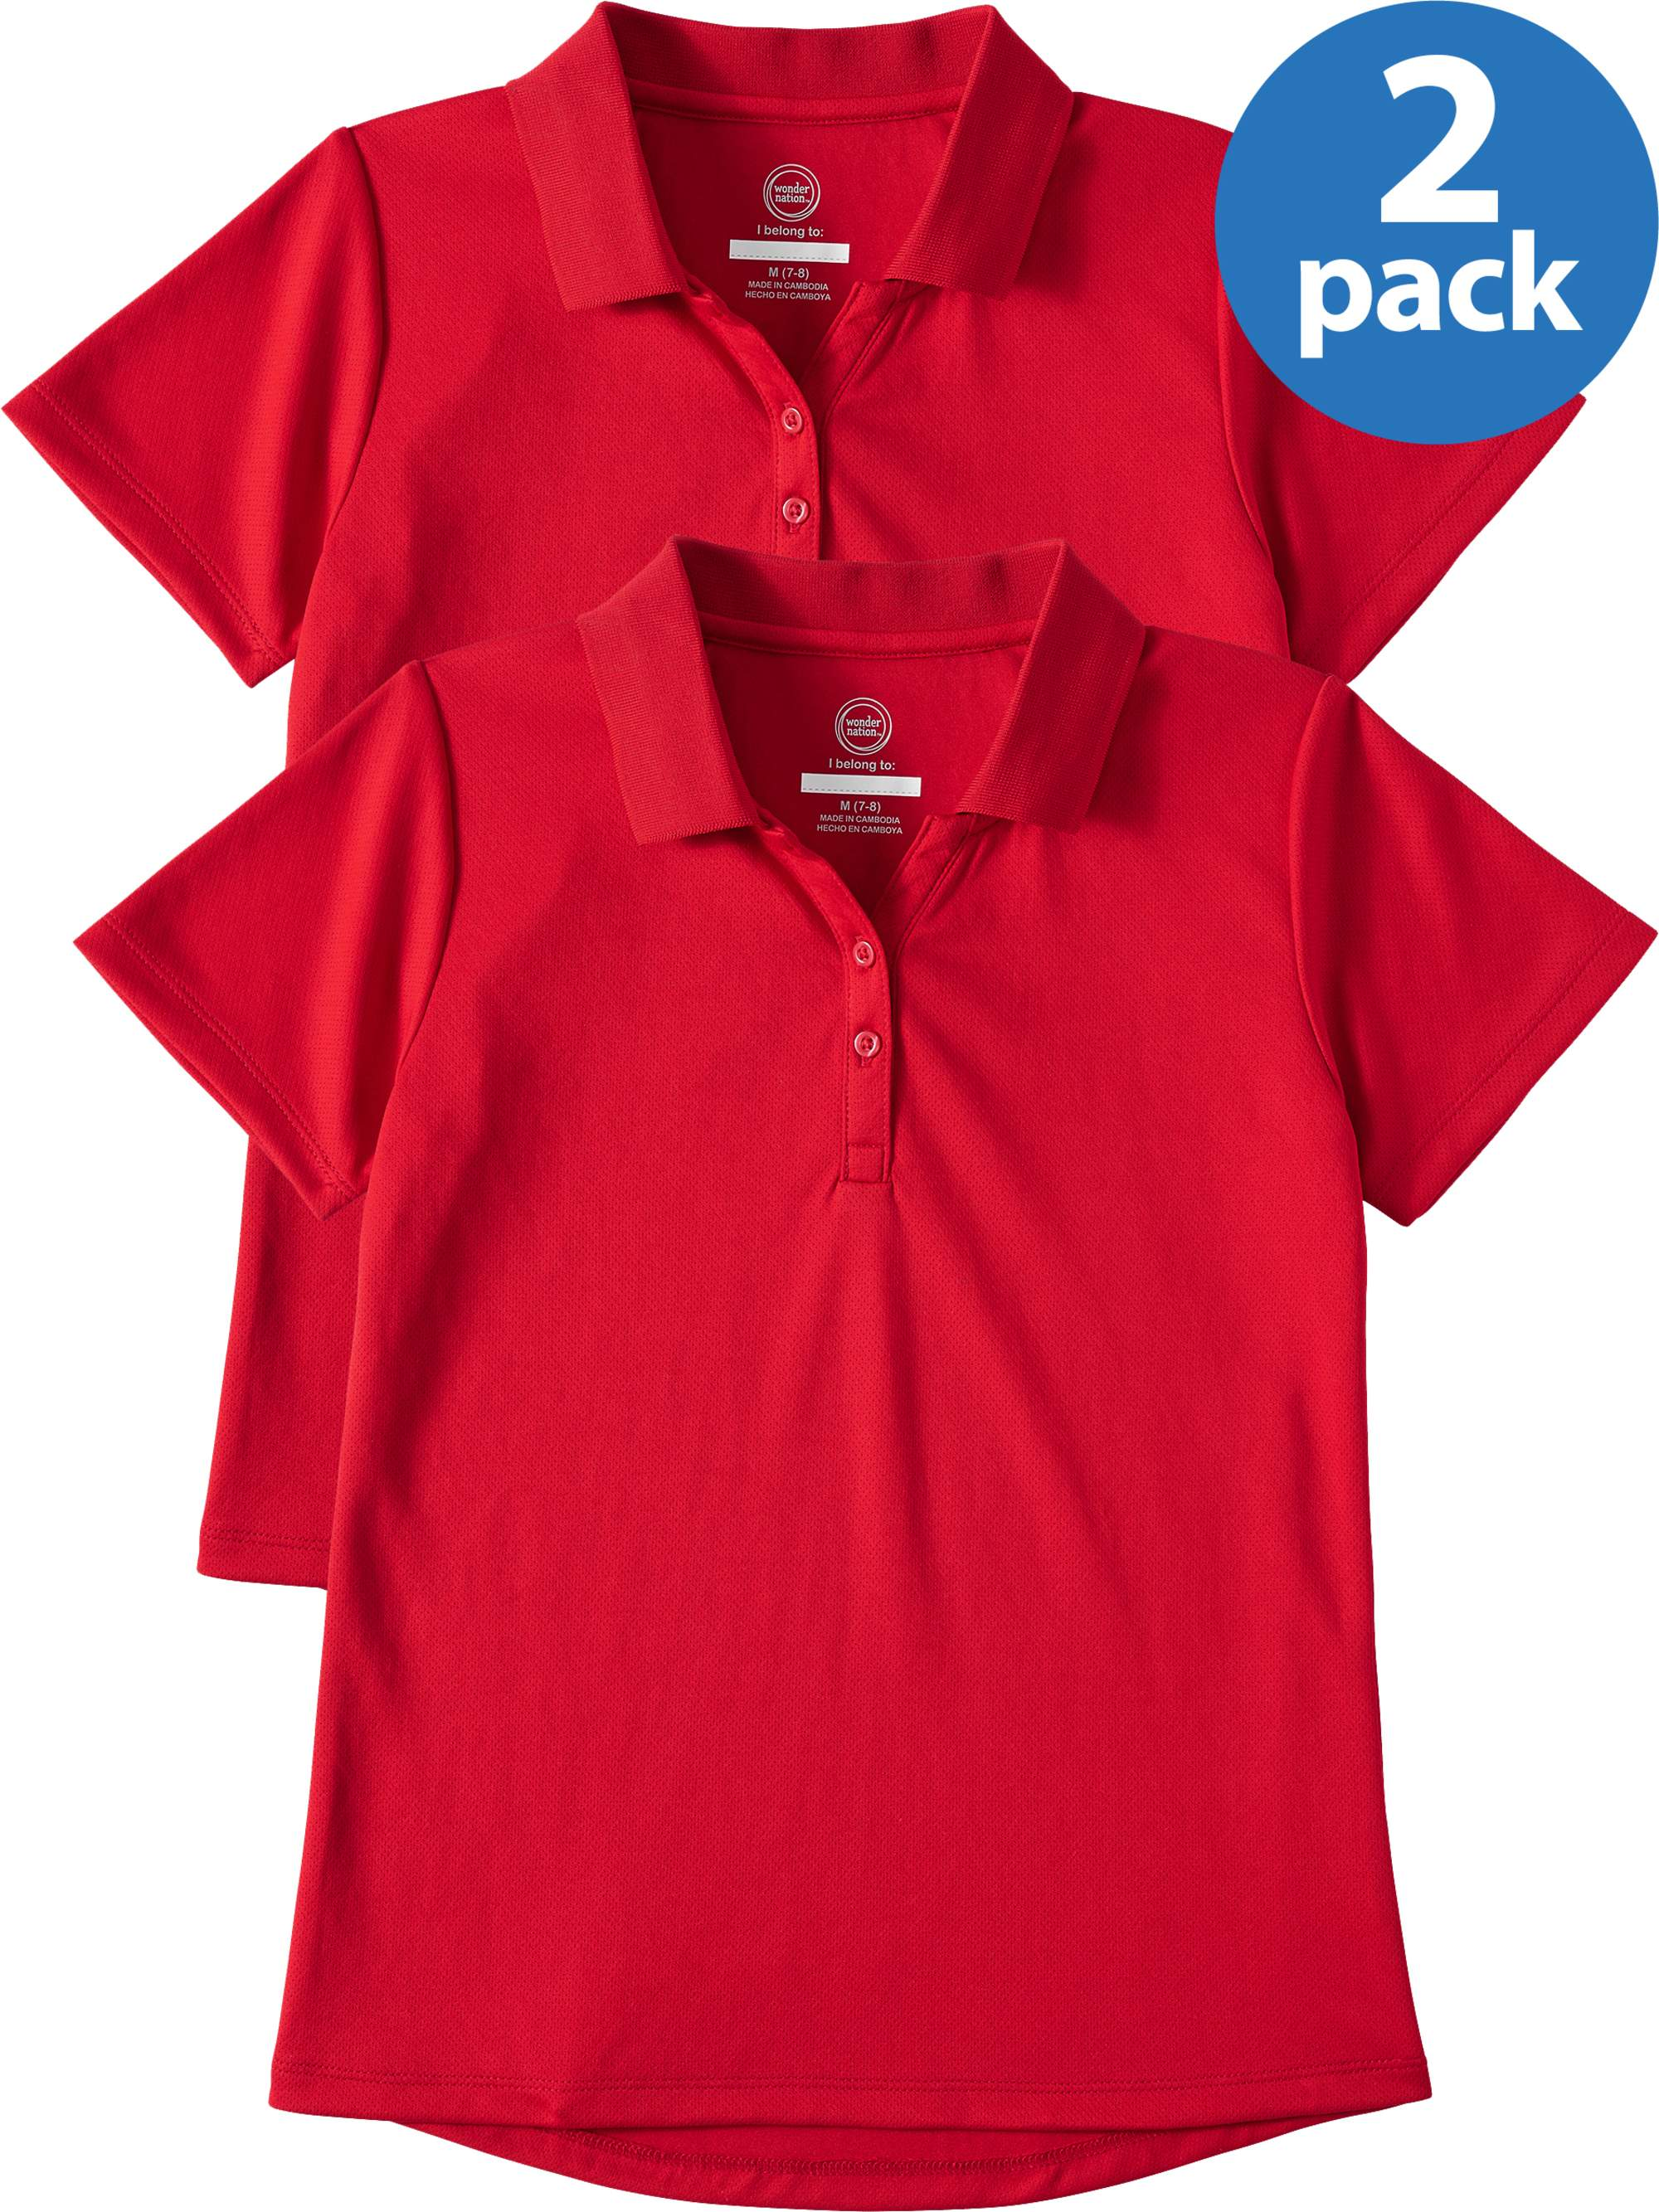 Olive NEW NWT Wonder Nation Long Sleeve Tee Shirt Boys White Red Wine Blue